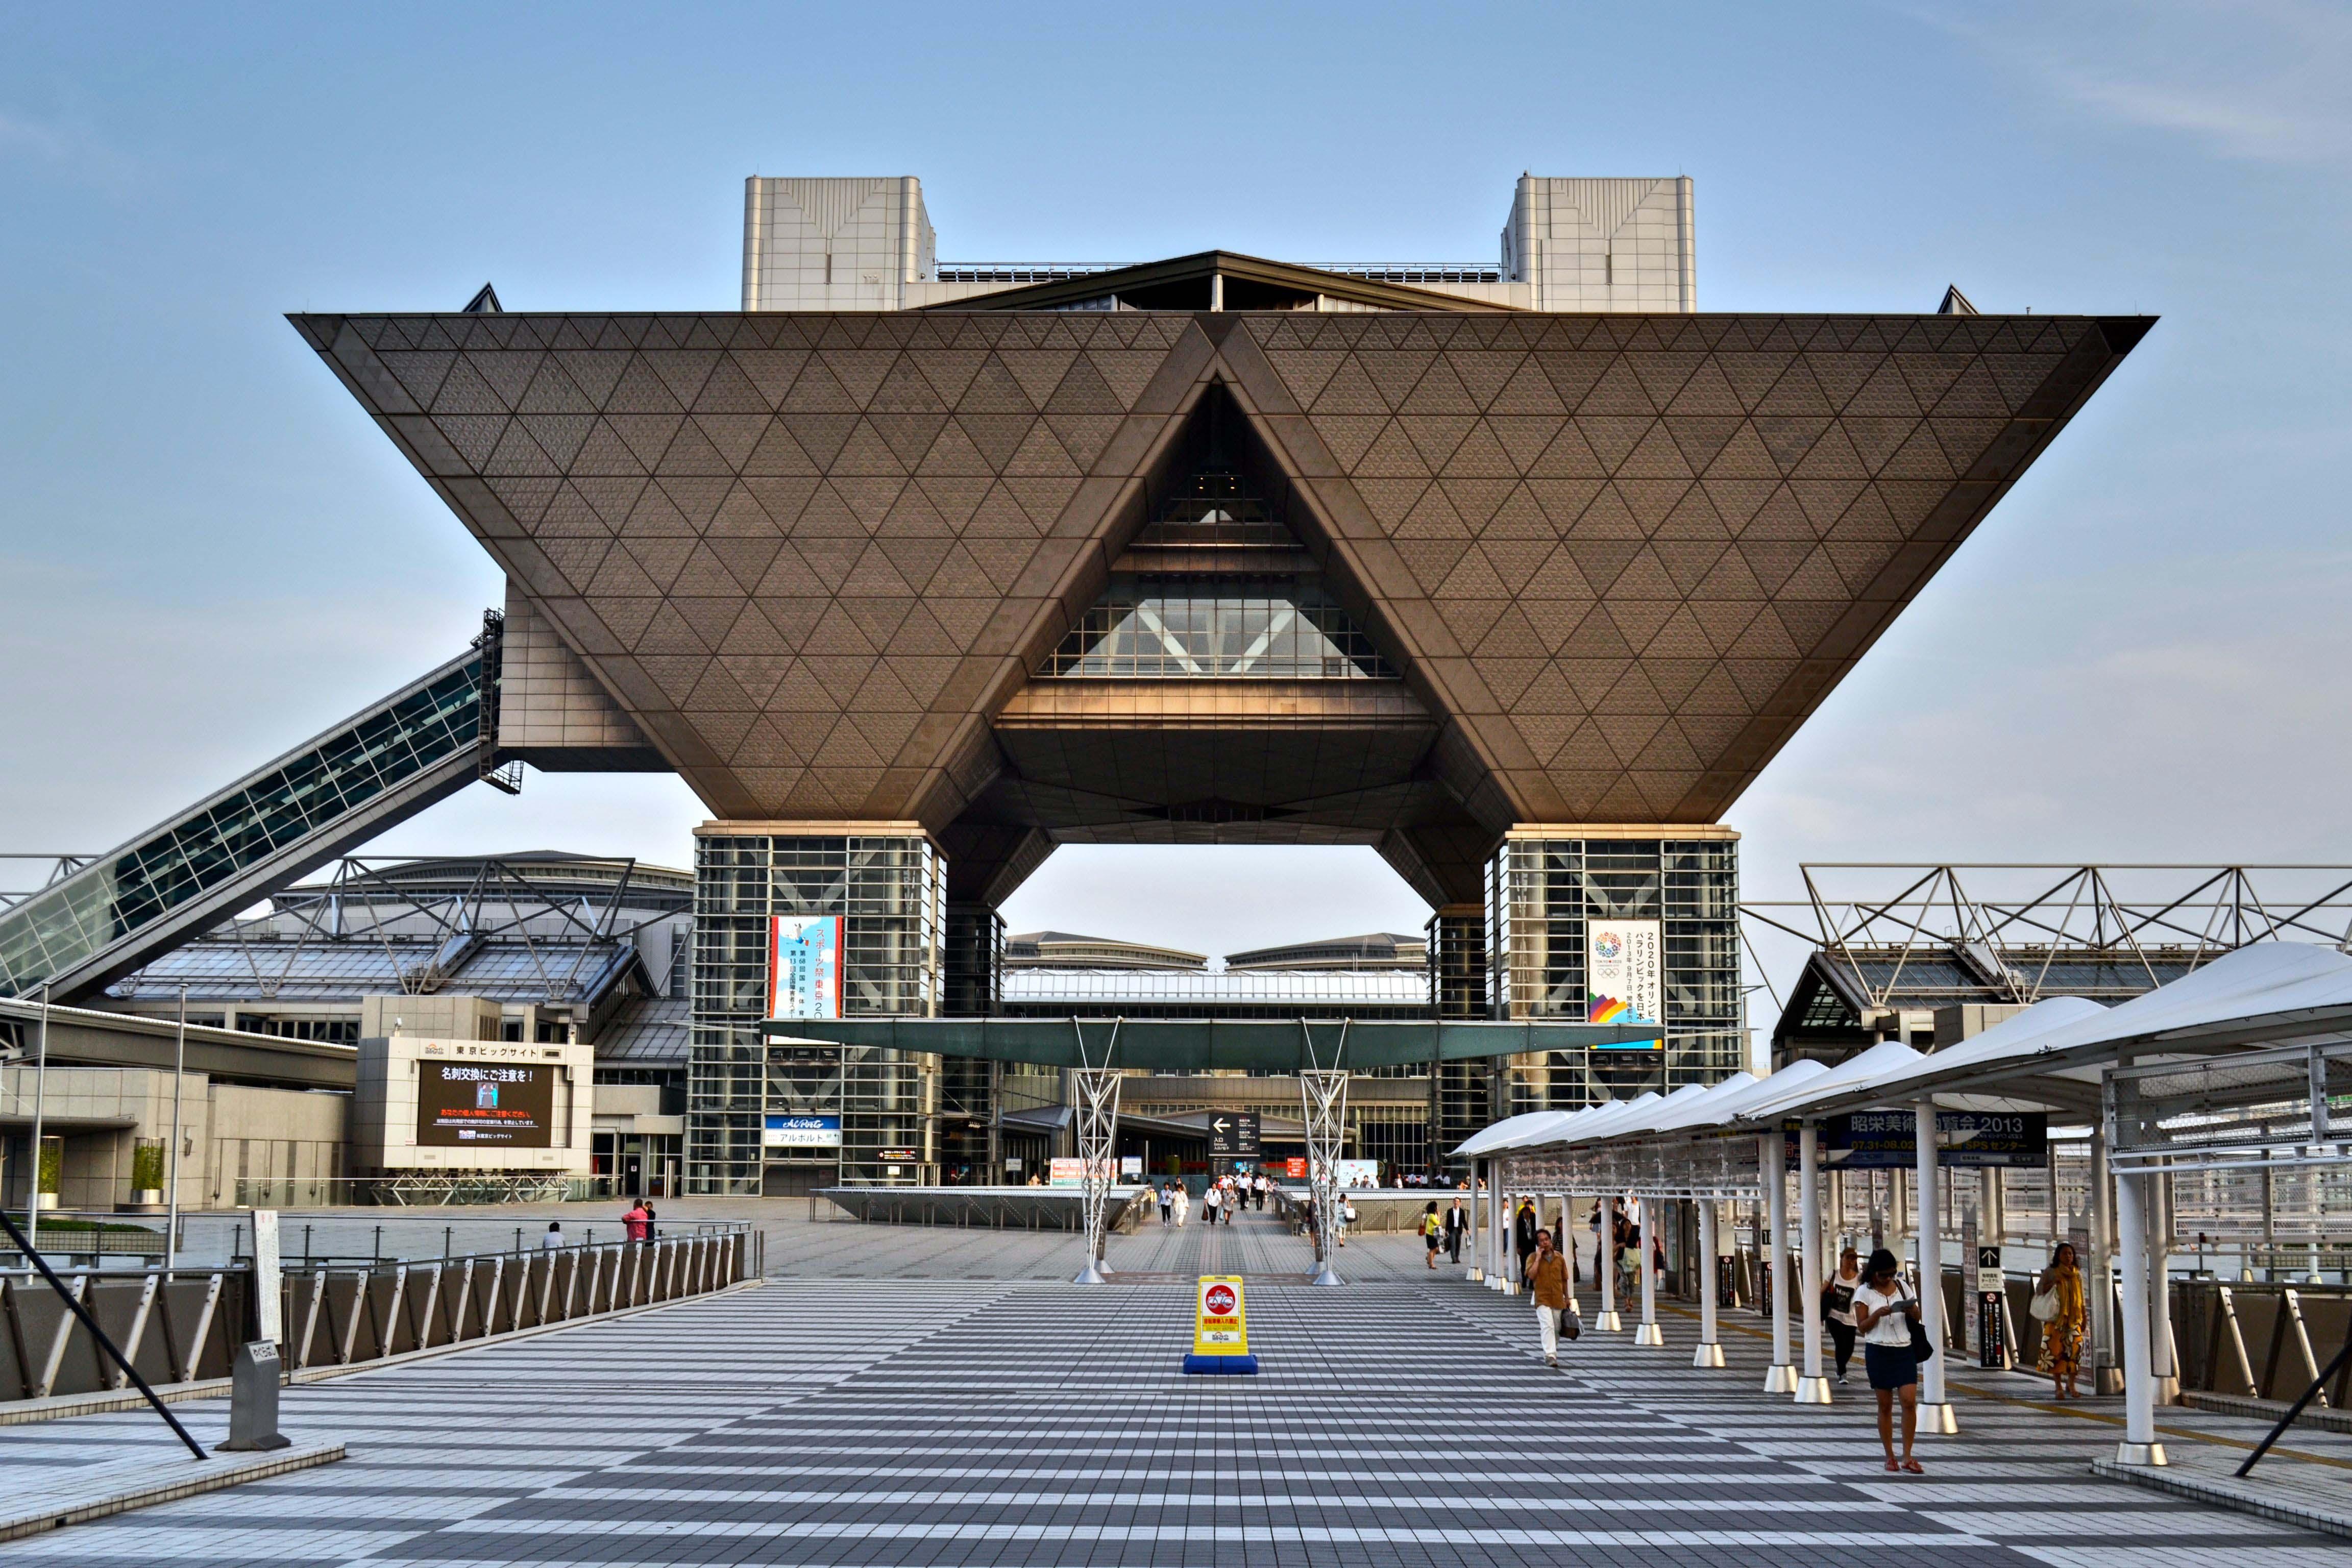 طوكيو، اليابان